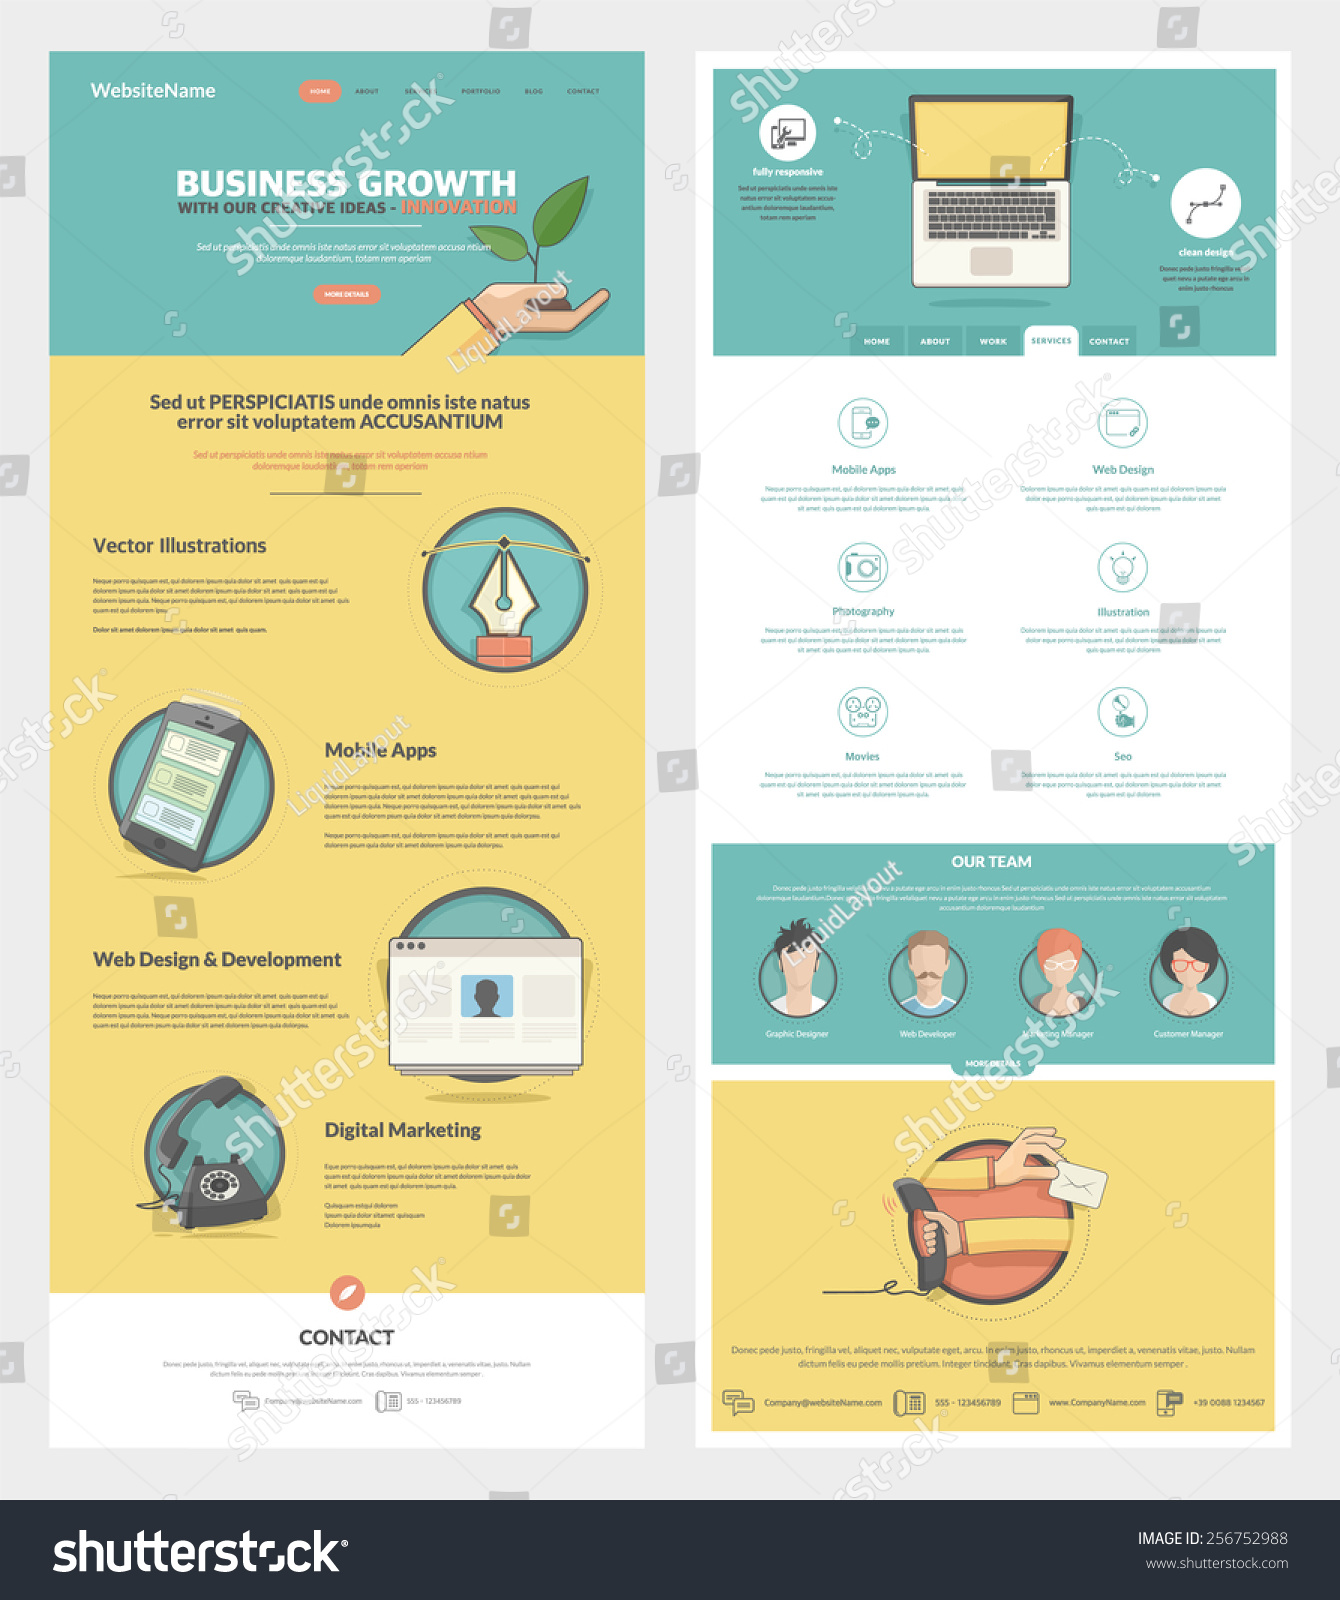 two page website design template concept 256752988 shutterstock. Black Bedroom Furniture Sets. Home Design Ideas